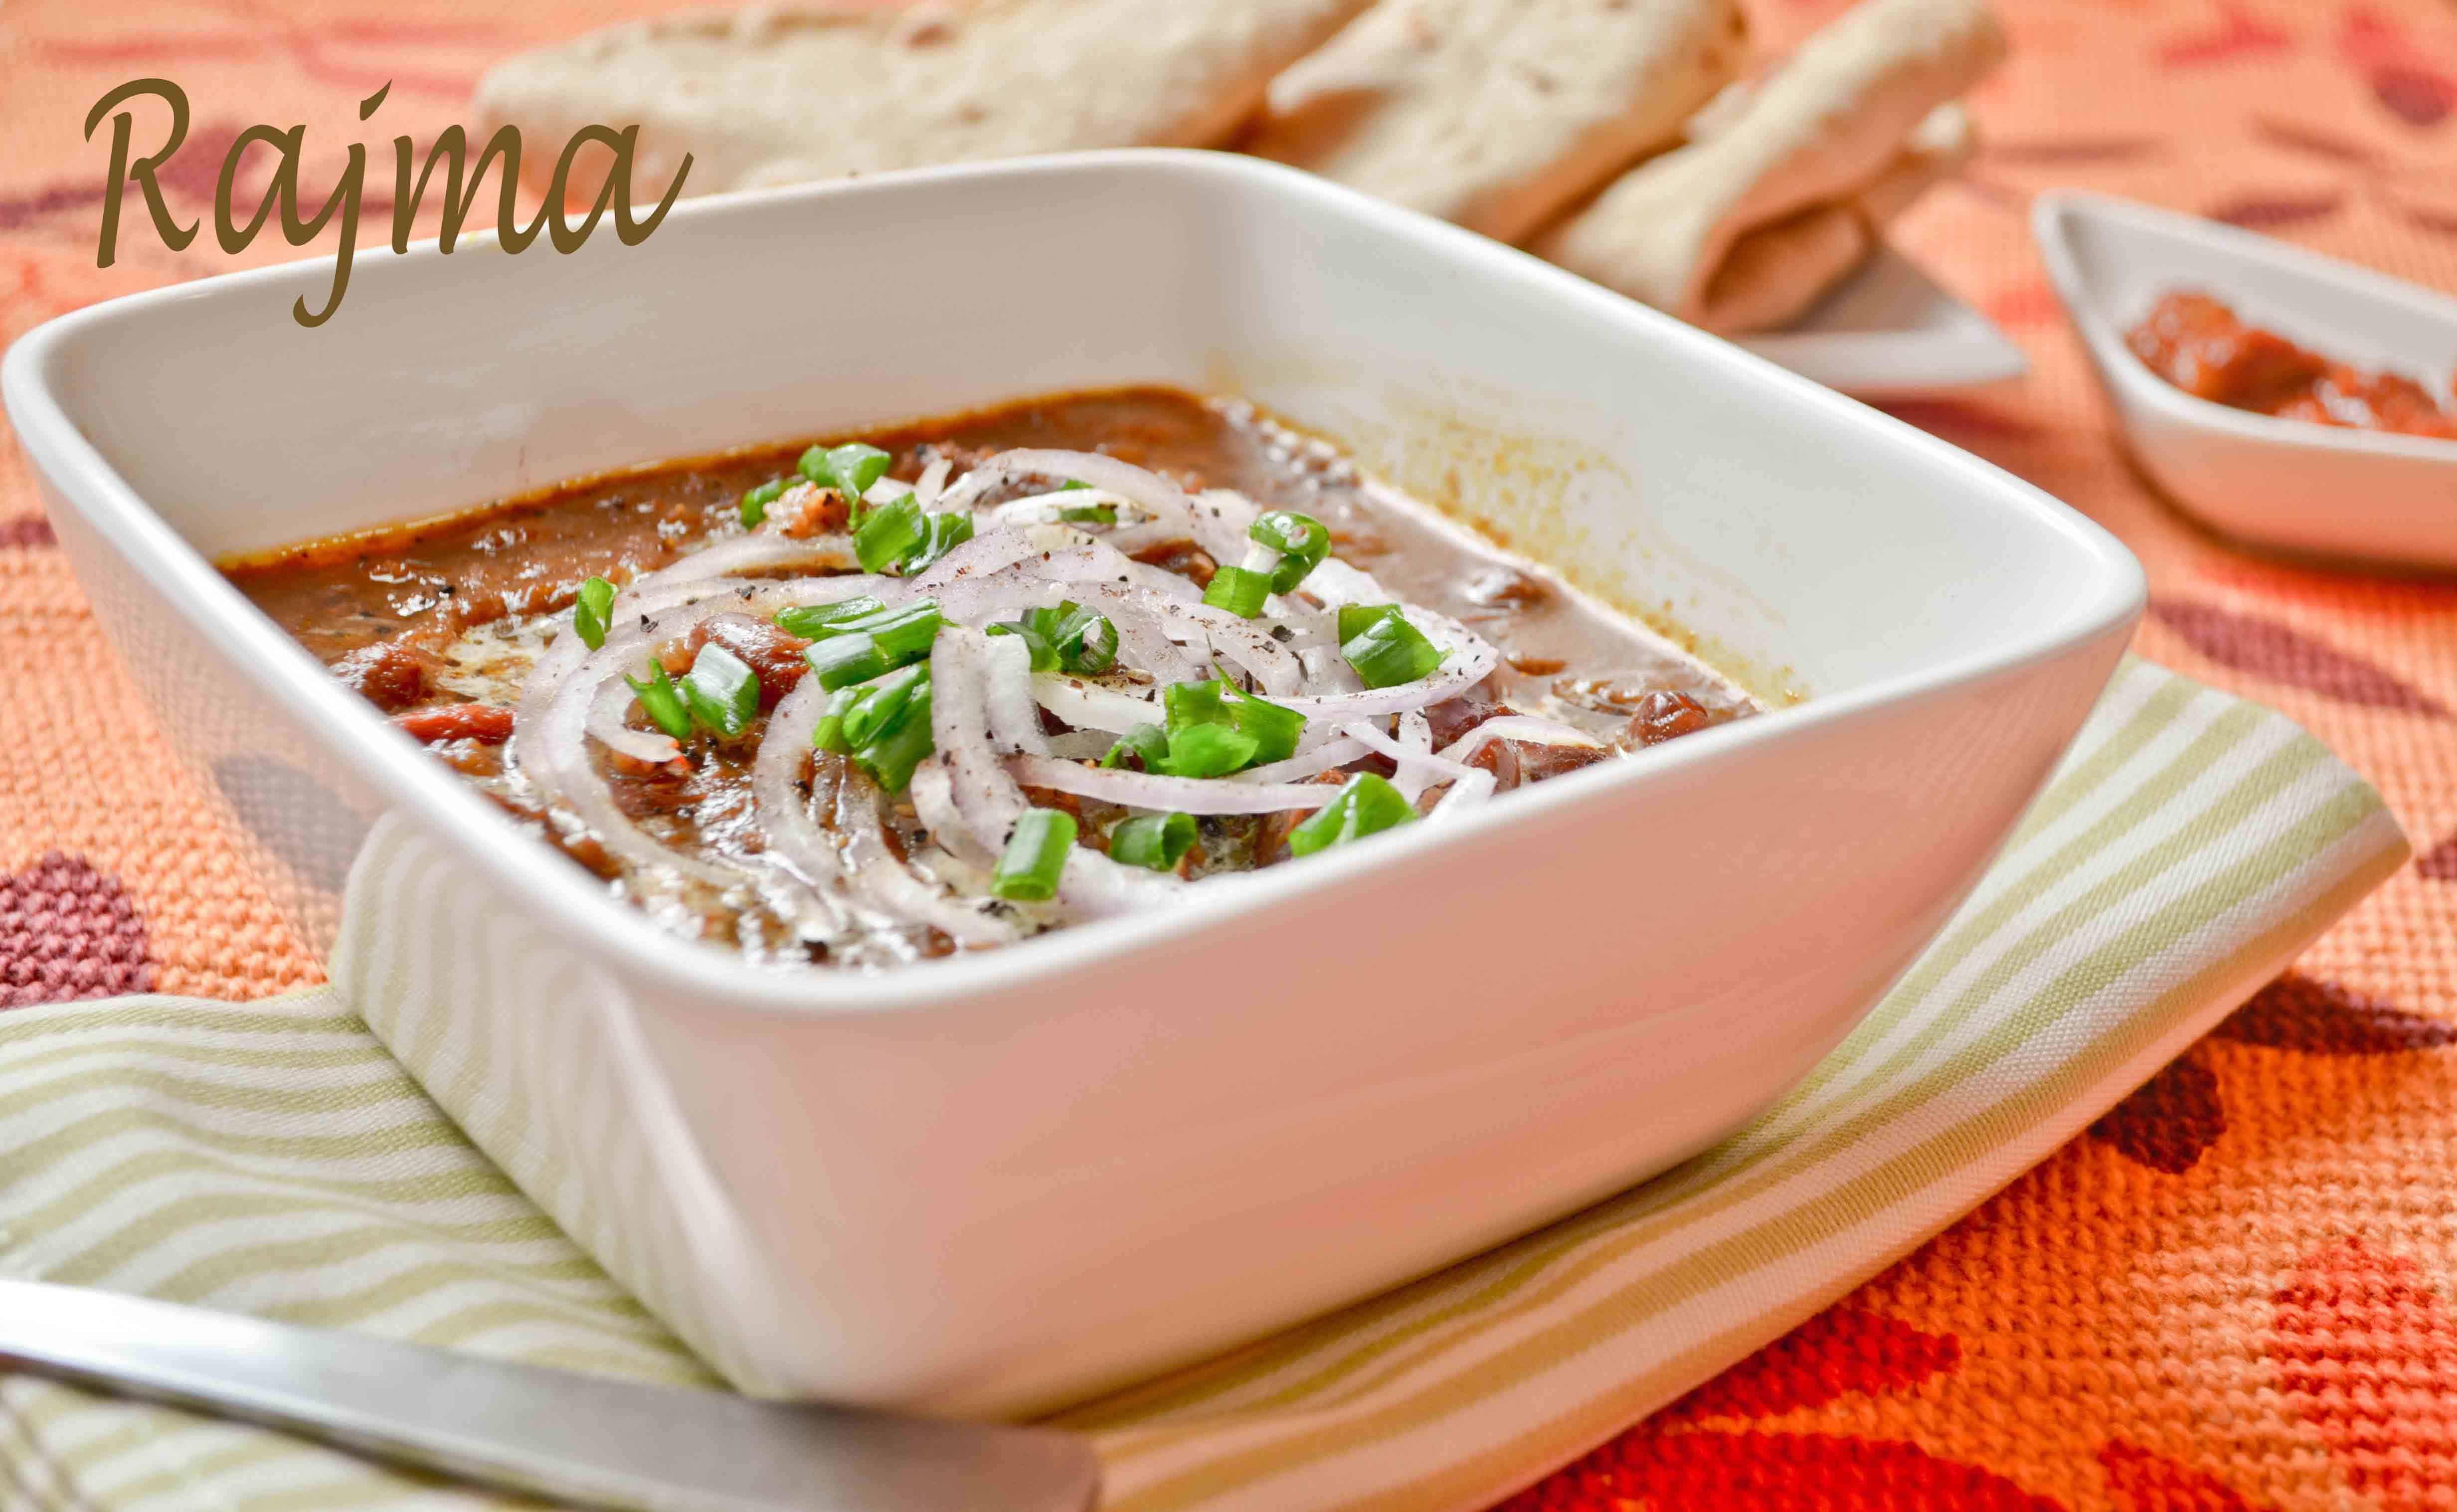 rajma banner Rajma - Red Kidney Beans Curry